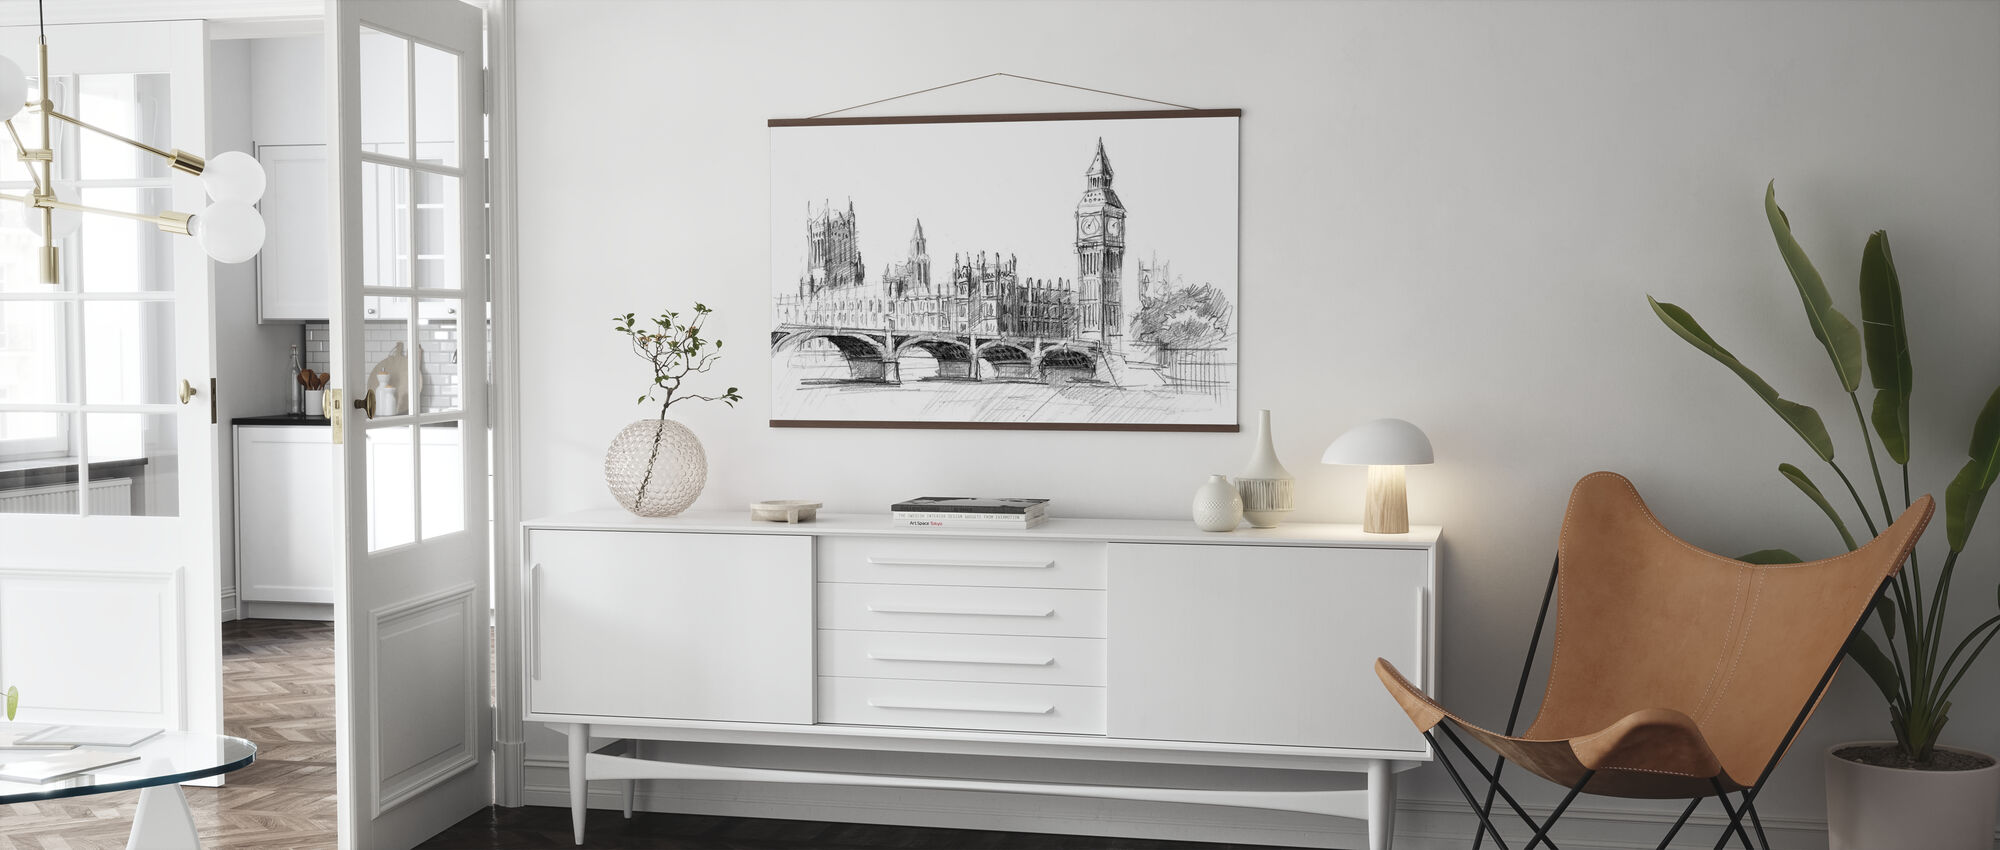 Big Ben in Black Lead - Poster - Living Room